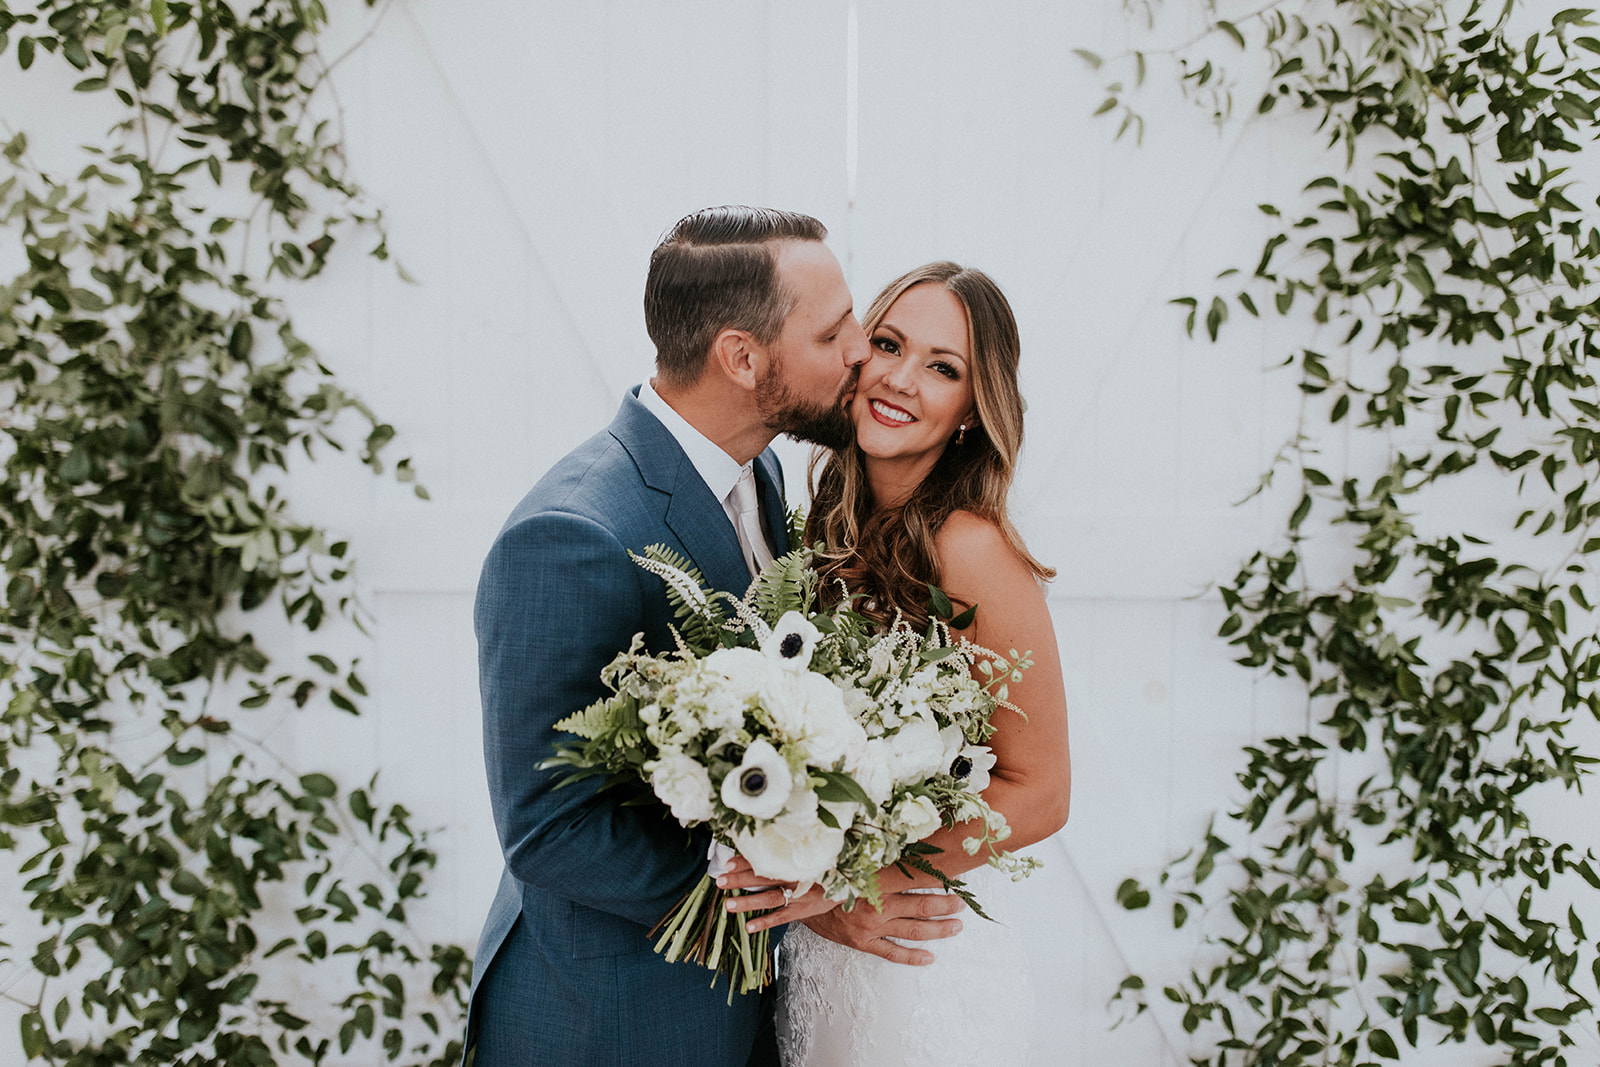 Whimsical Garden Wedding at 14TENN | Nashville Bride Guide